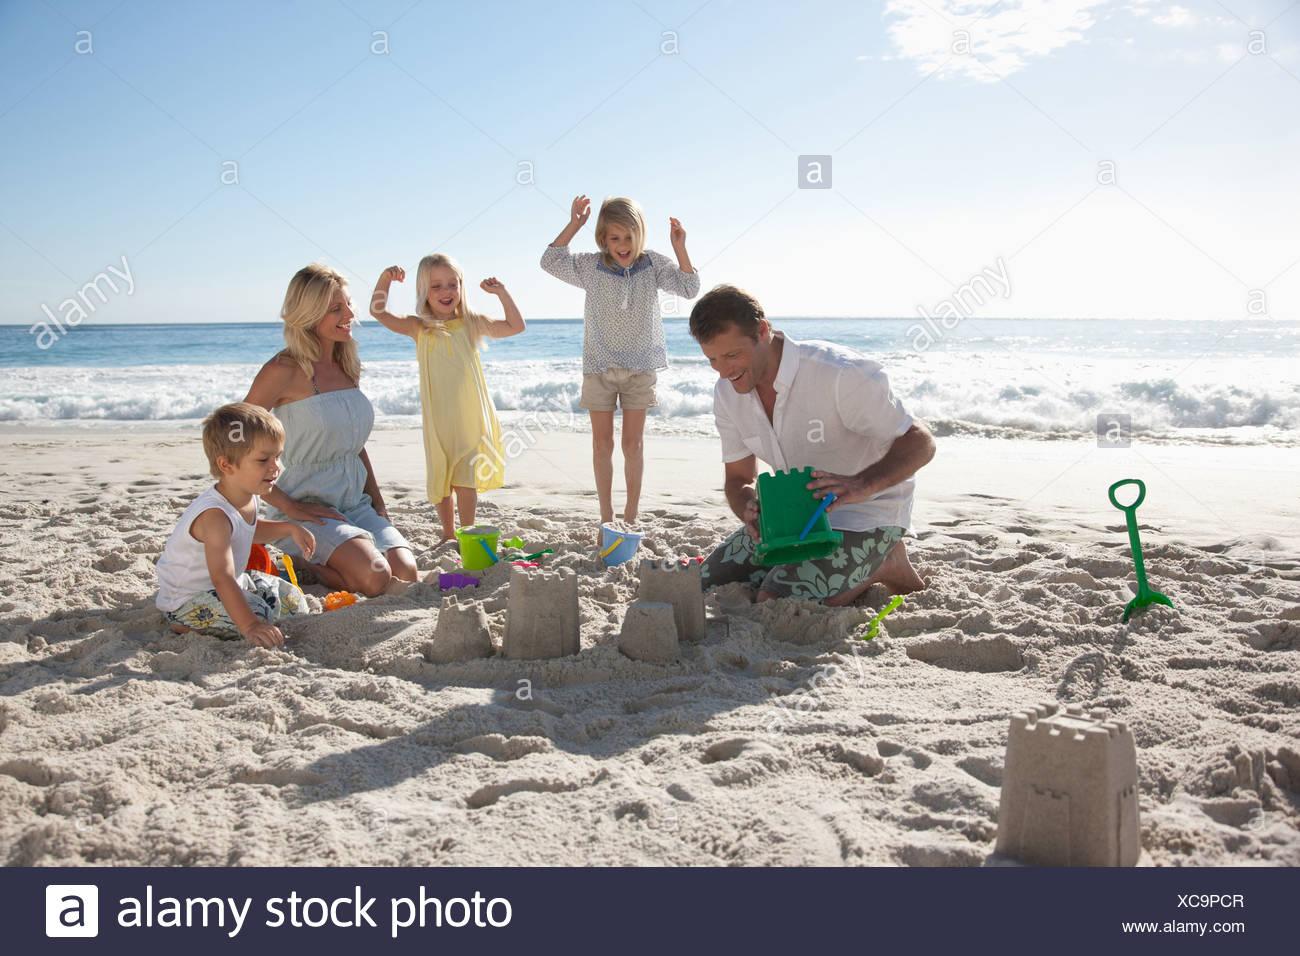 Family making sand castles on beach - Stock Image